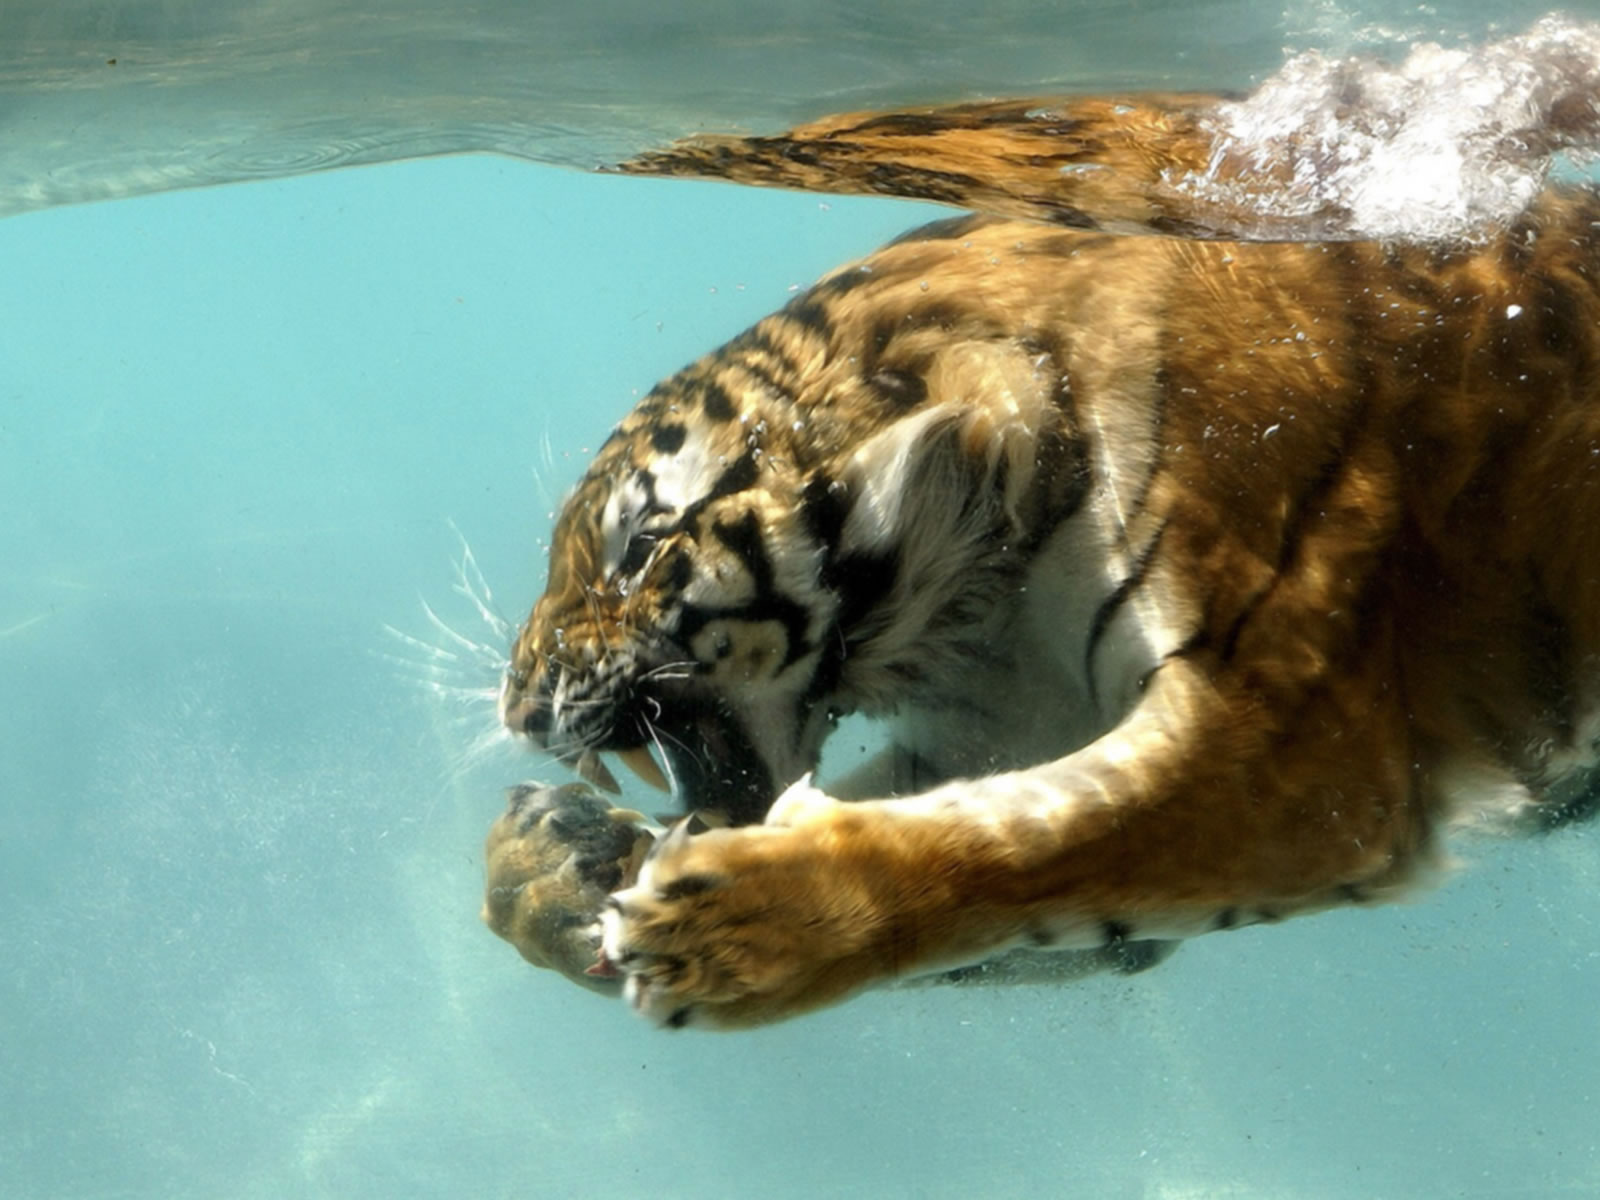 Tiger Wallpaper Pack 4 (1600x1200)